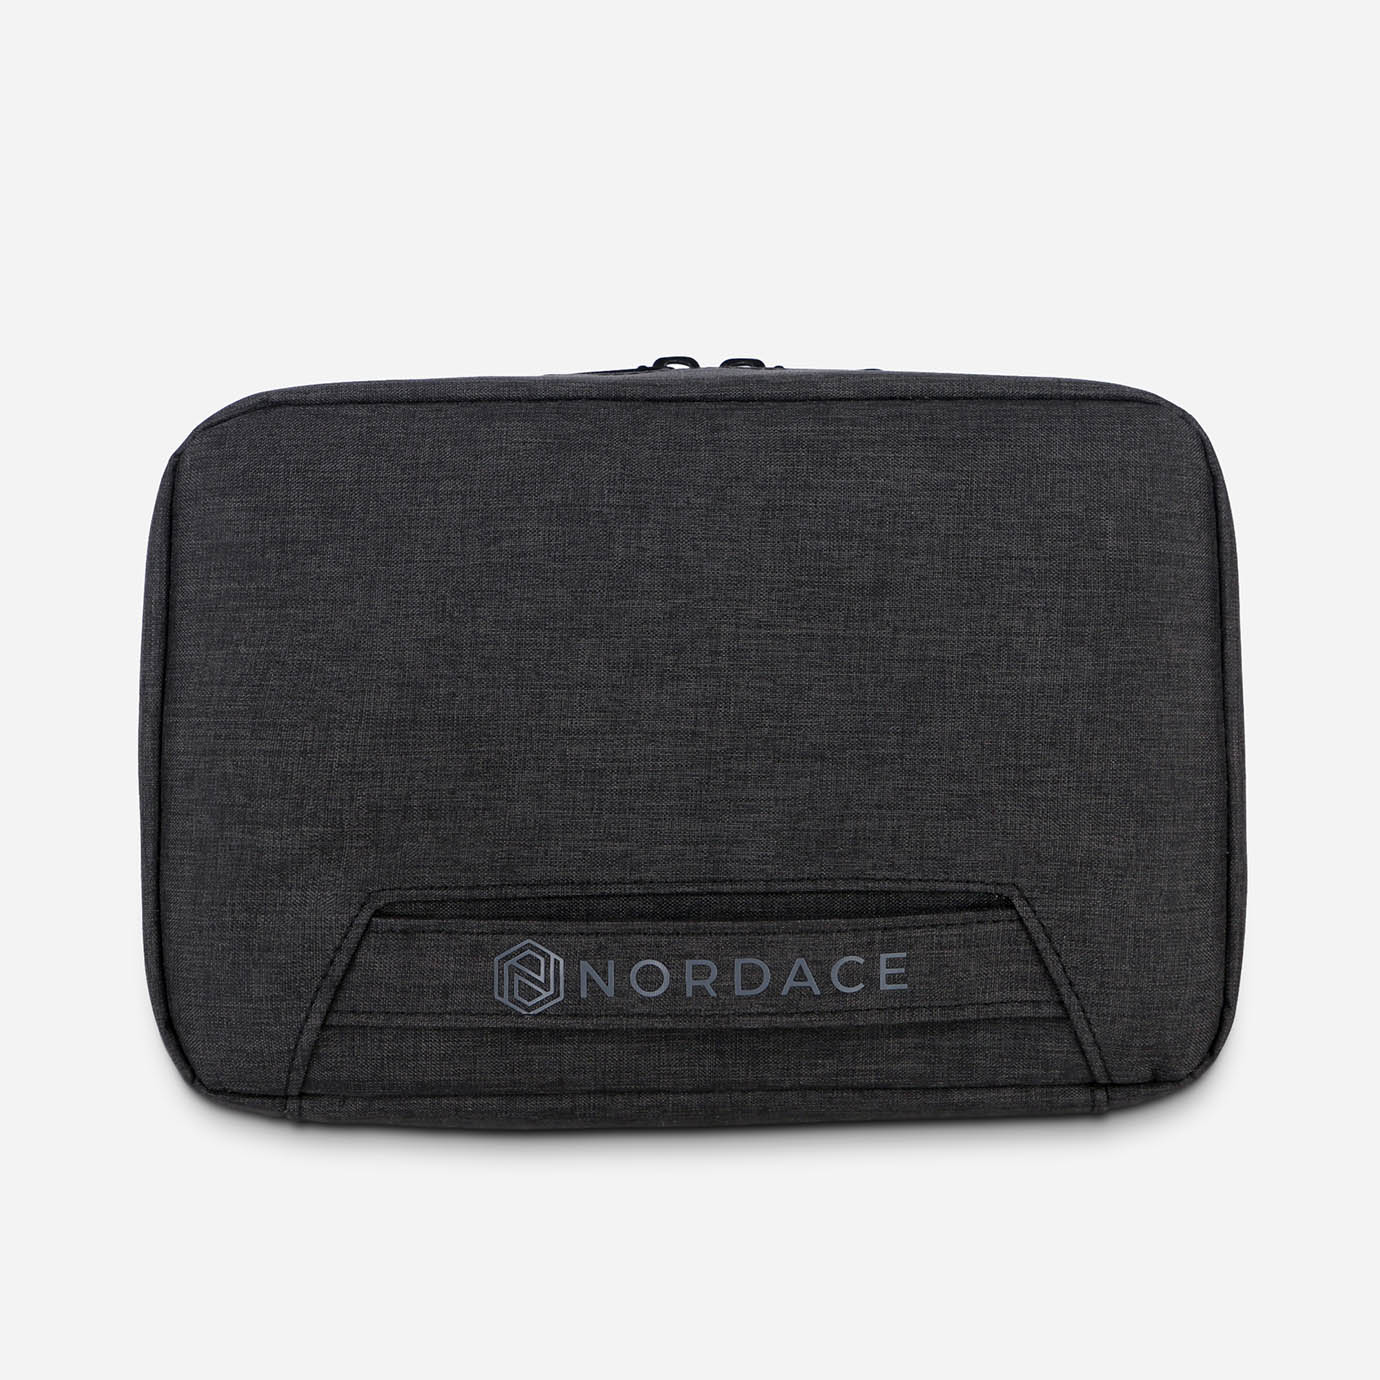 Nordace Windsor Tech Pouch